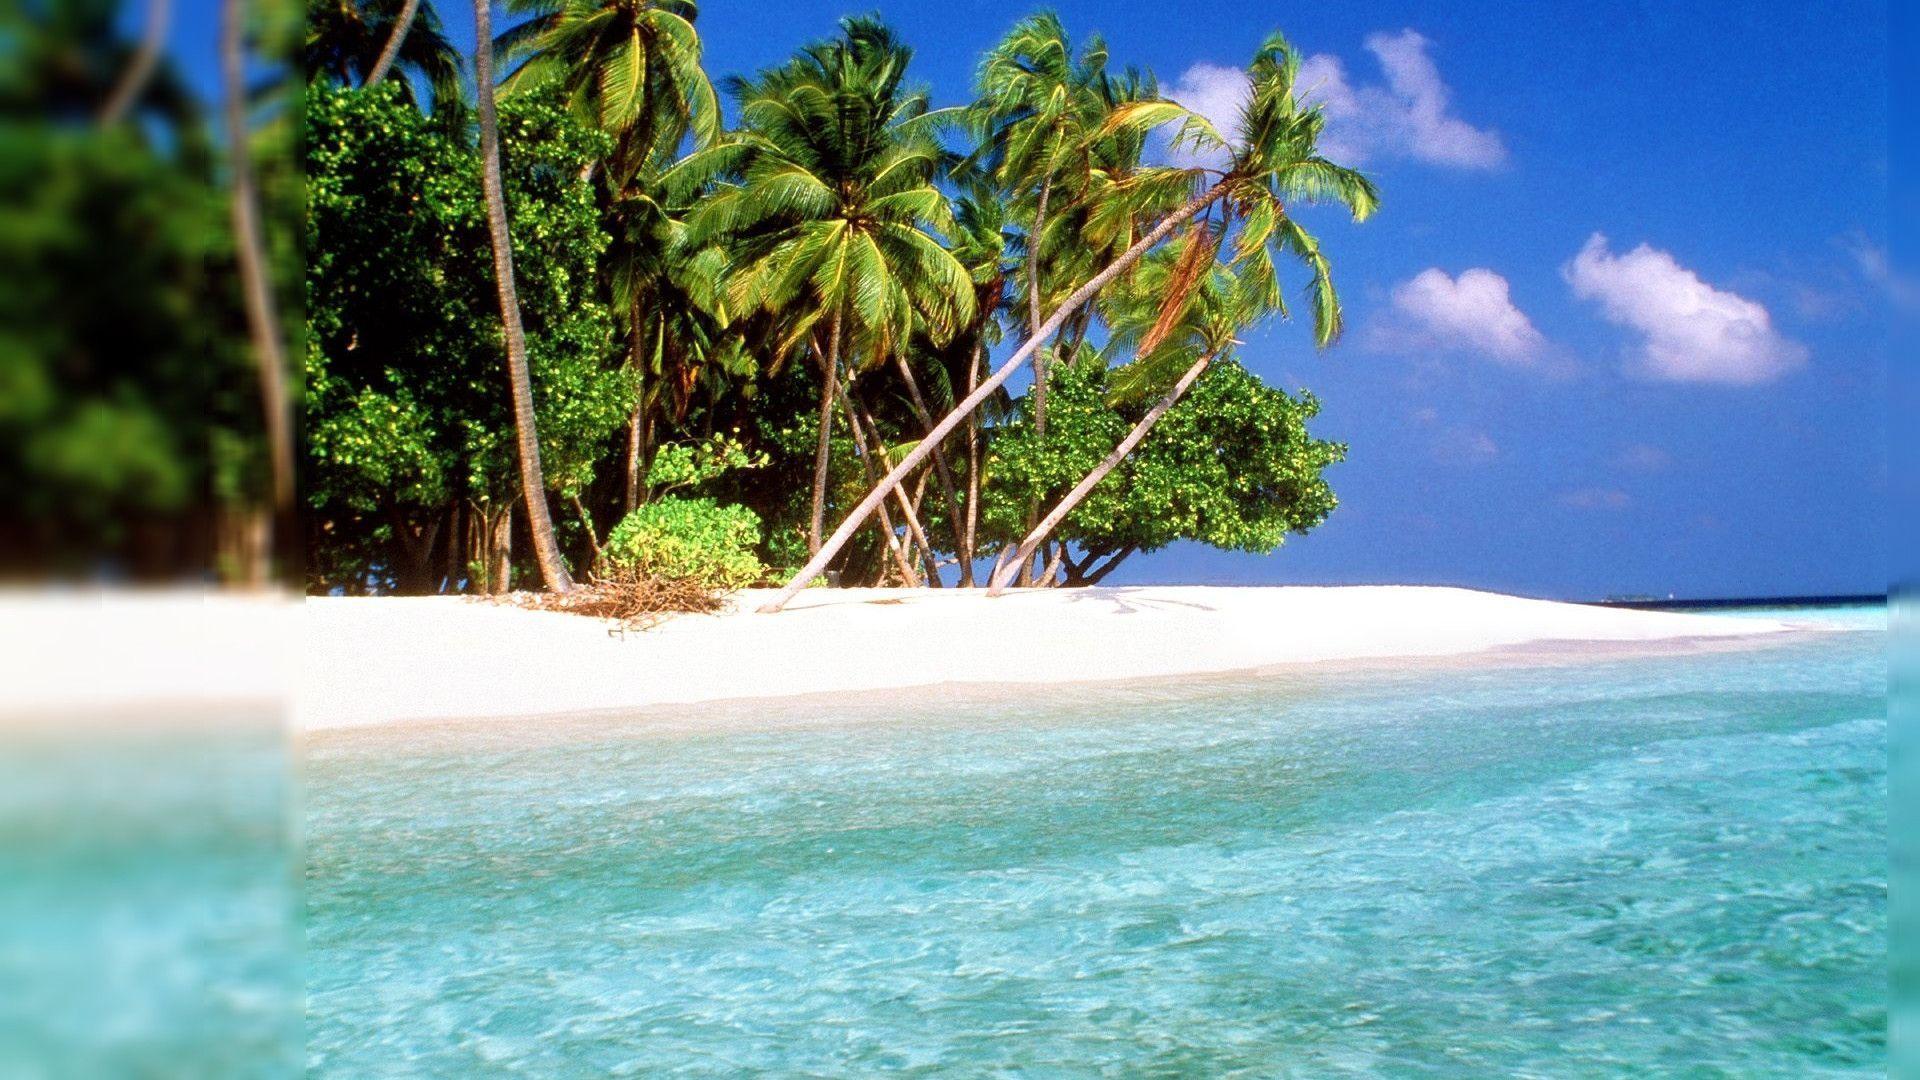 Hd Tropical Island Beach Paradise Wallpapers And Backgrounds: Desktop Backgrounds Tropical